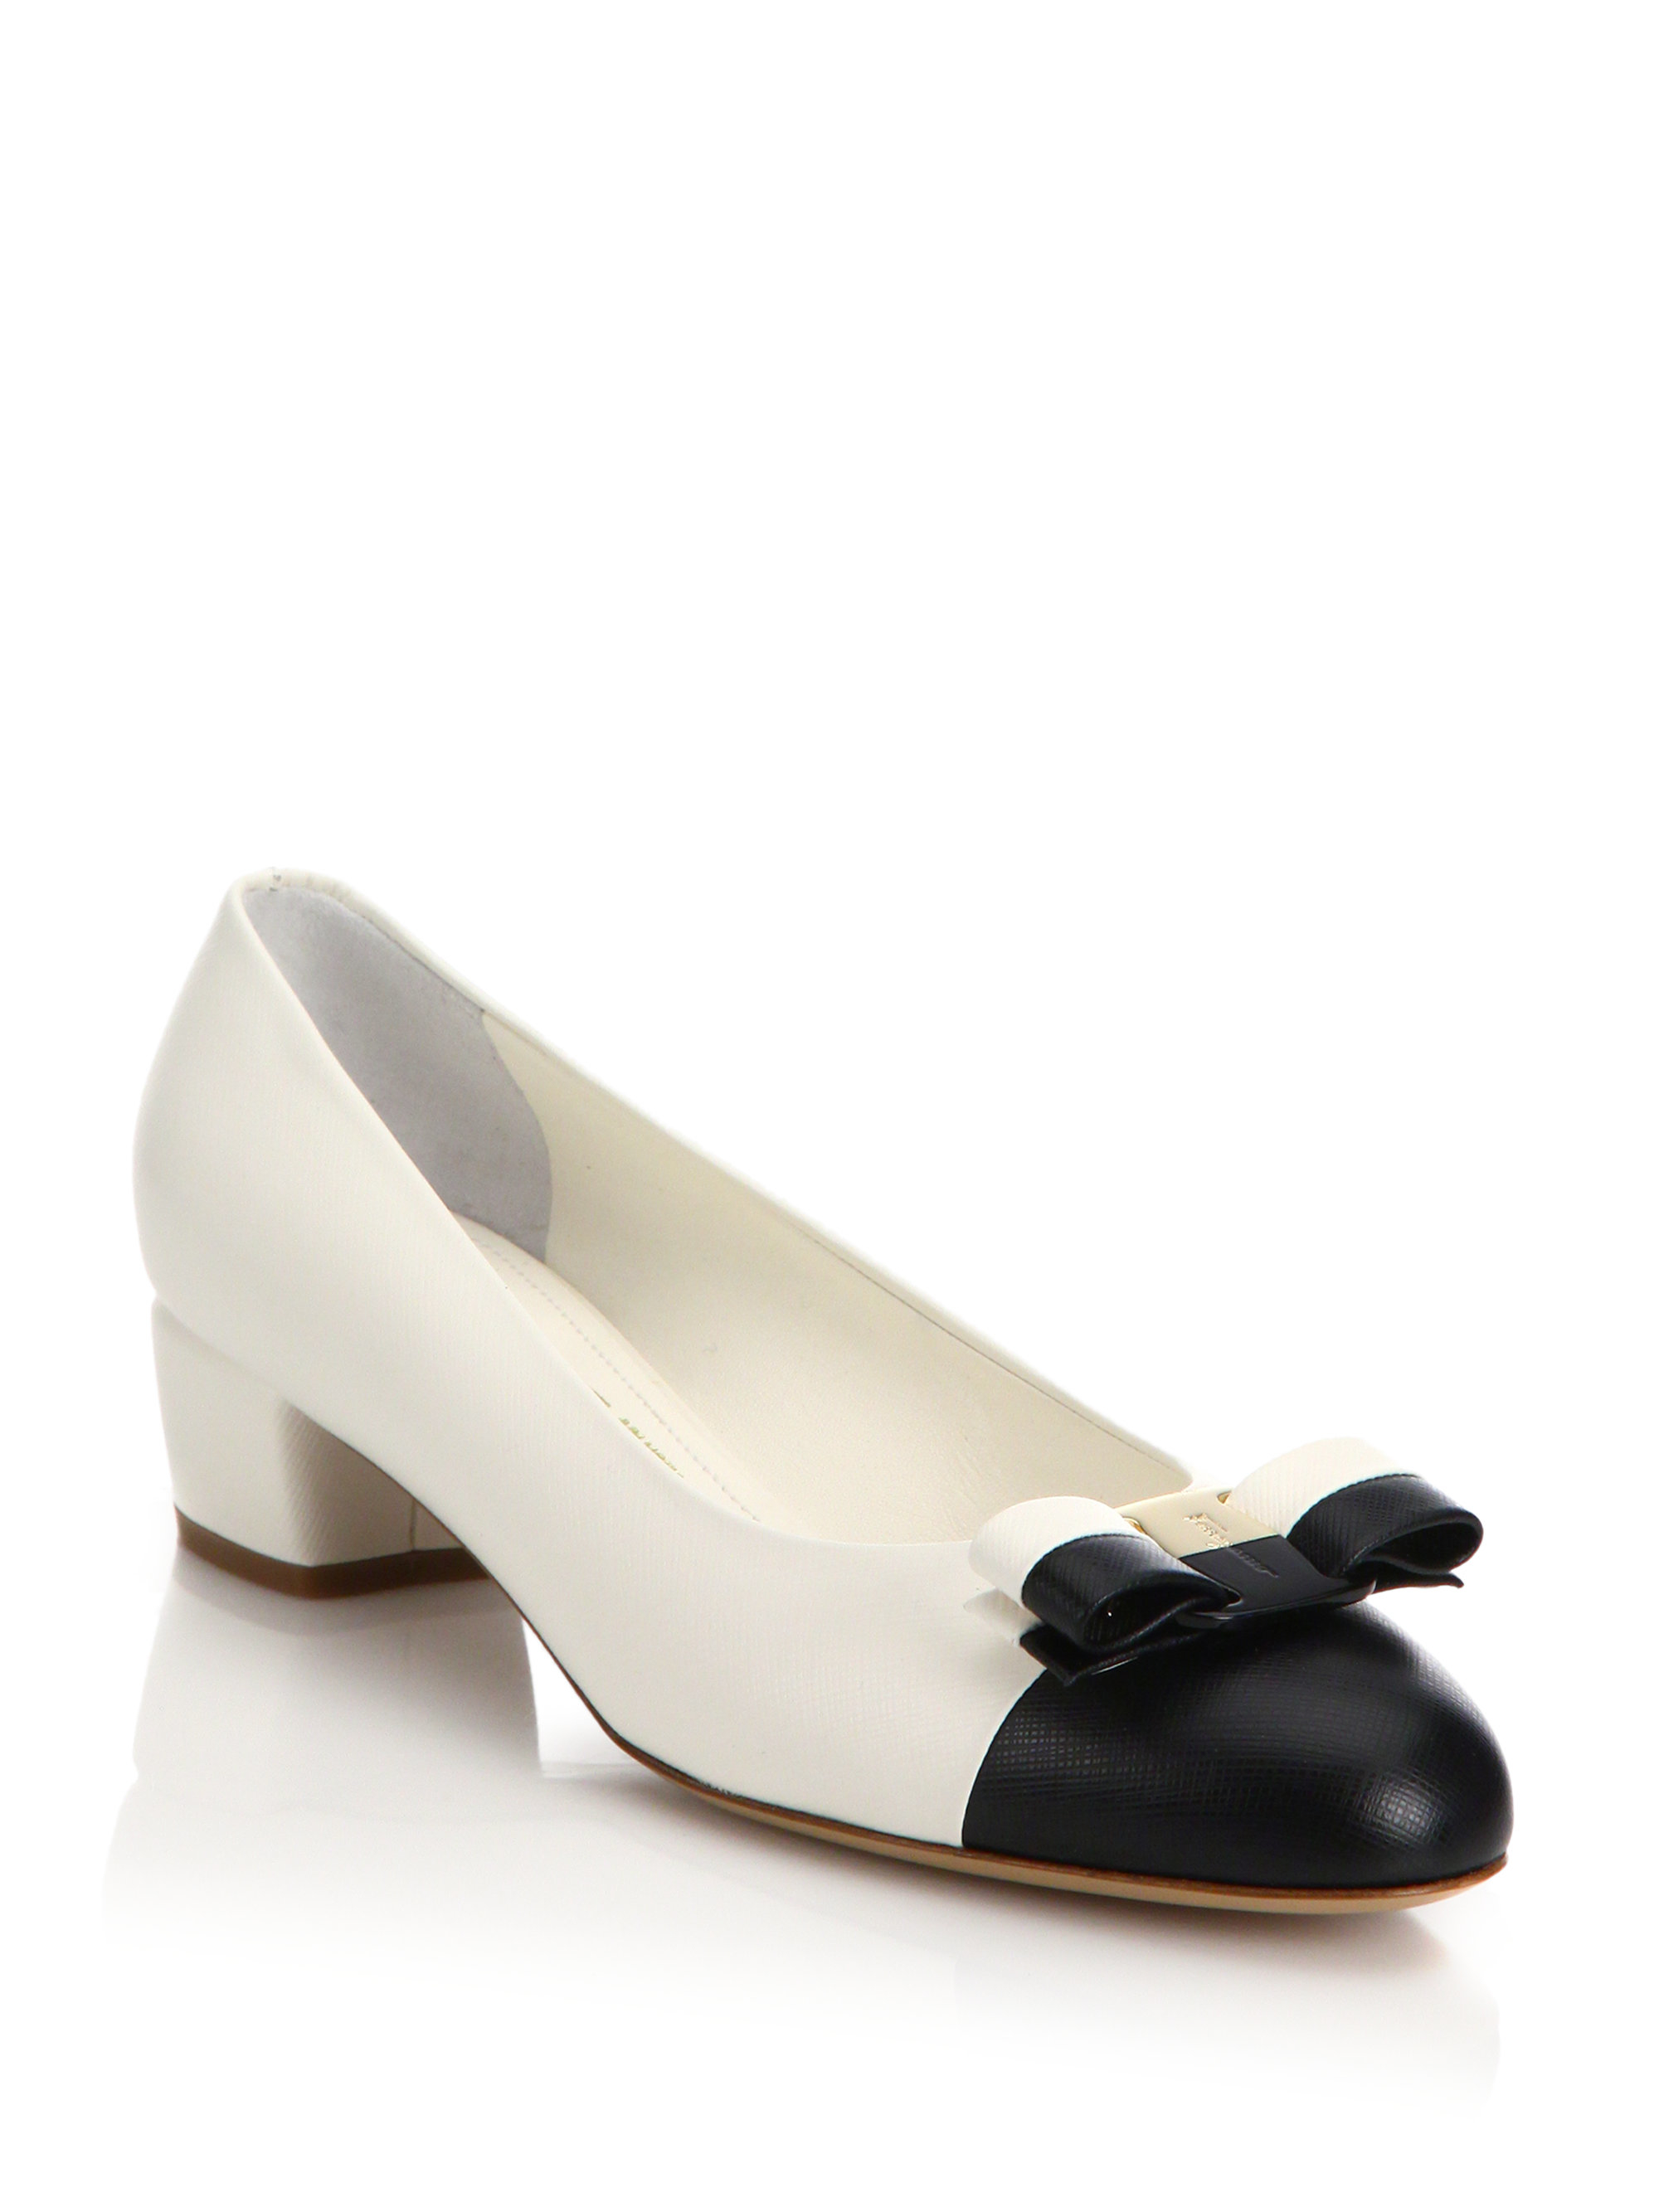 c4c2fd2f6d1 Lyst - Ferragamo Vara Saffiano Leather Cap-toe Pumps in White